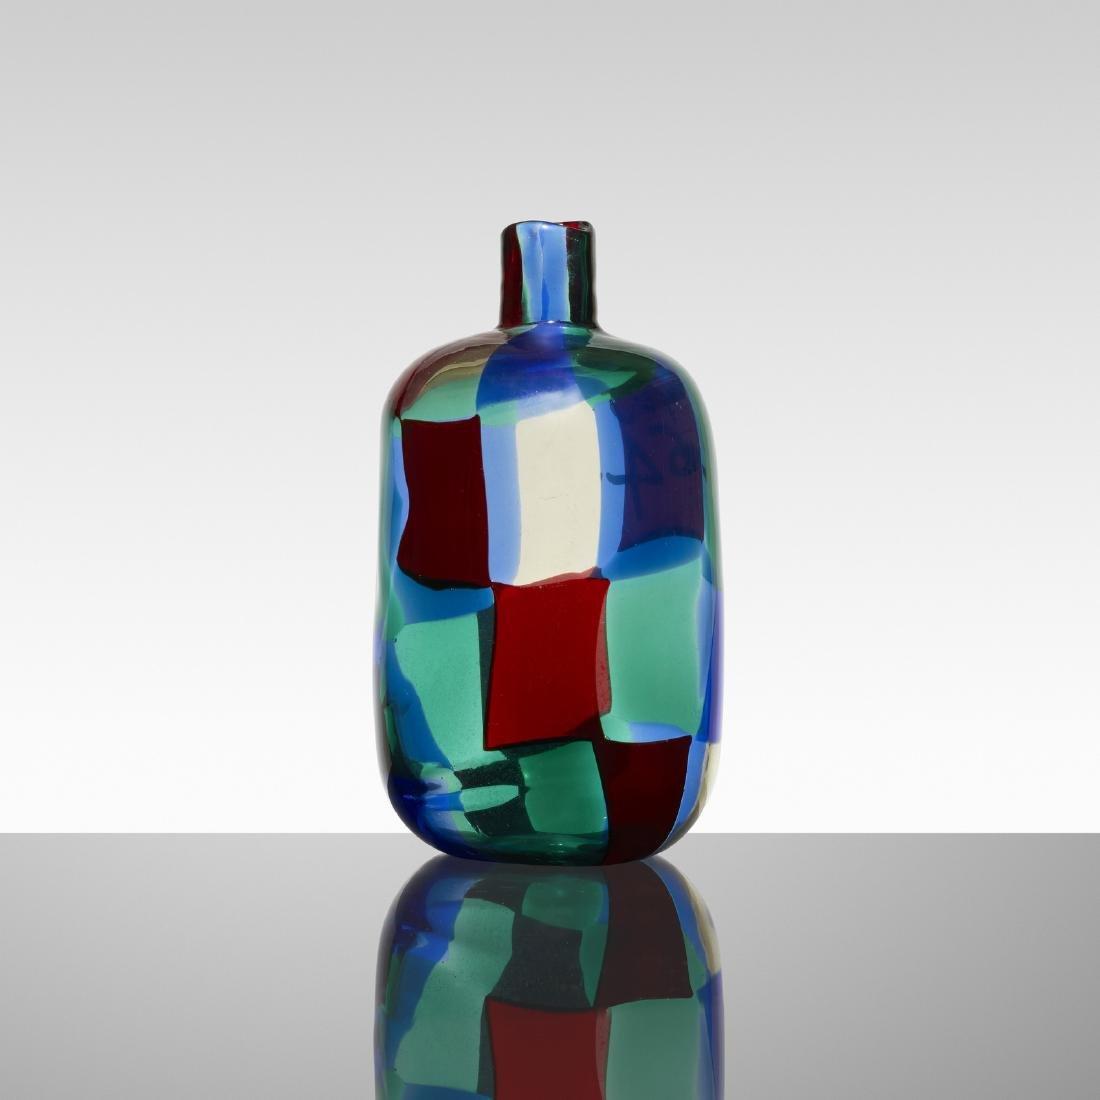 Fulvio Bianconi, prototype Pezzato vase, model 905 L64